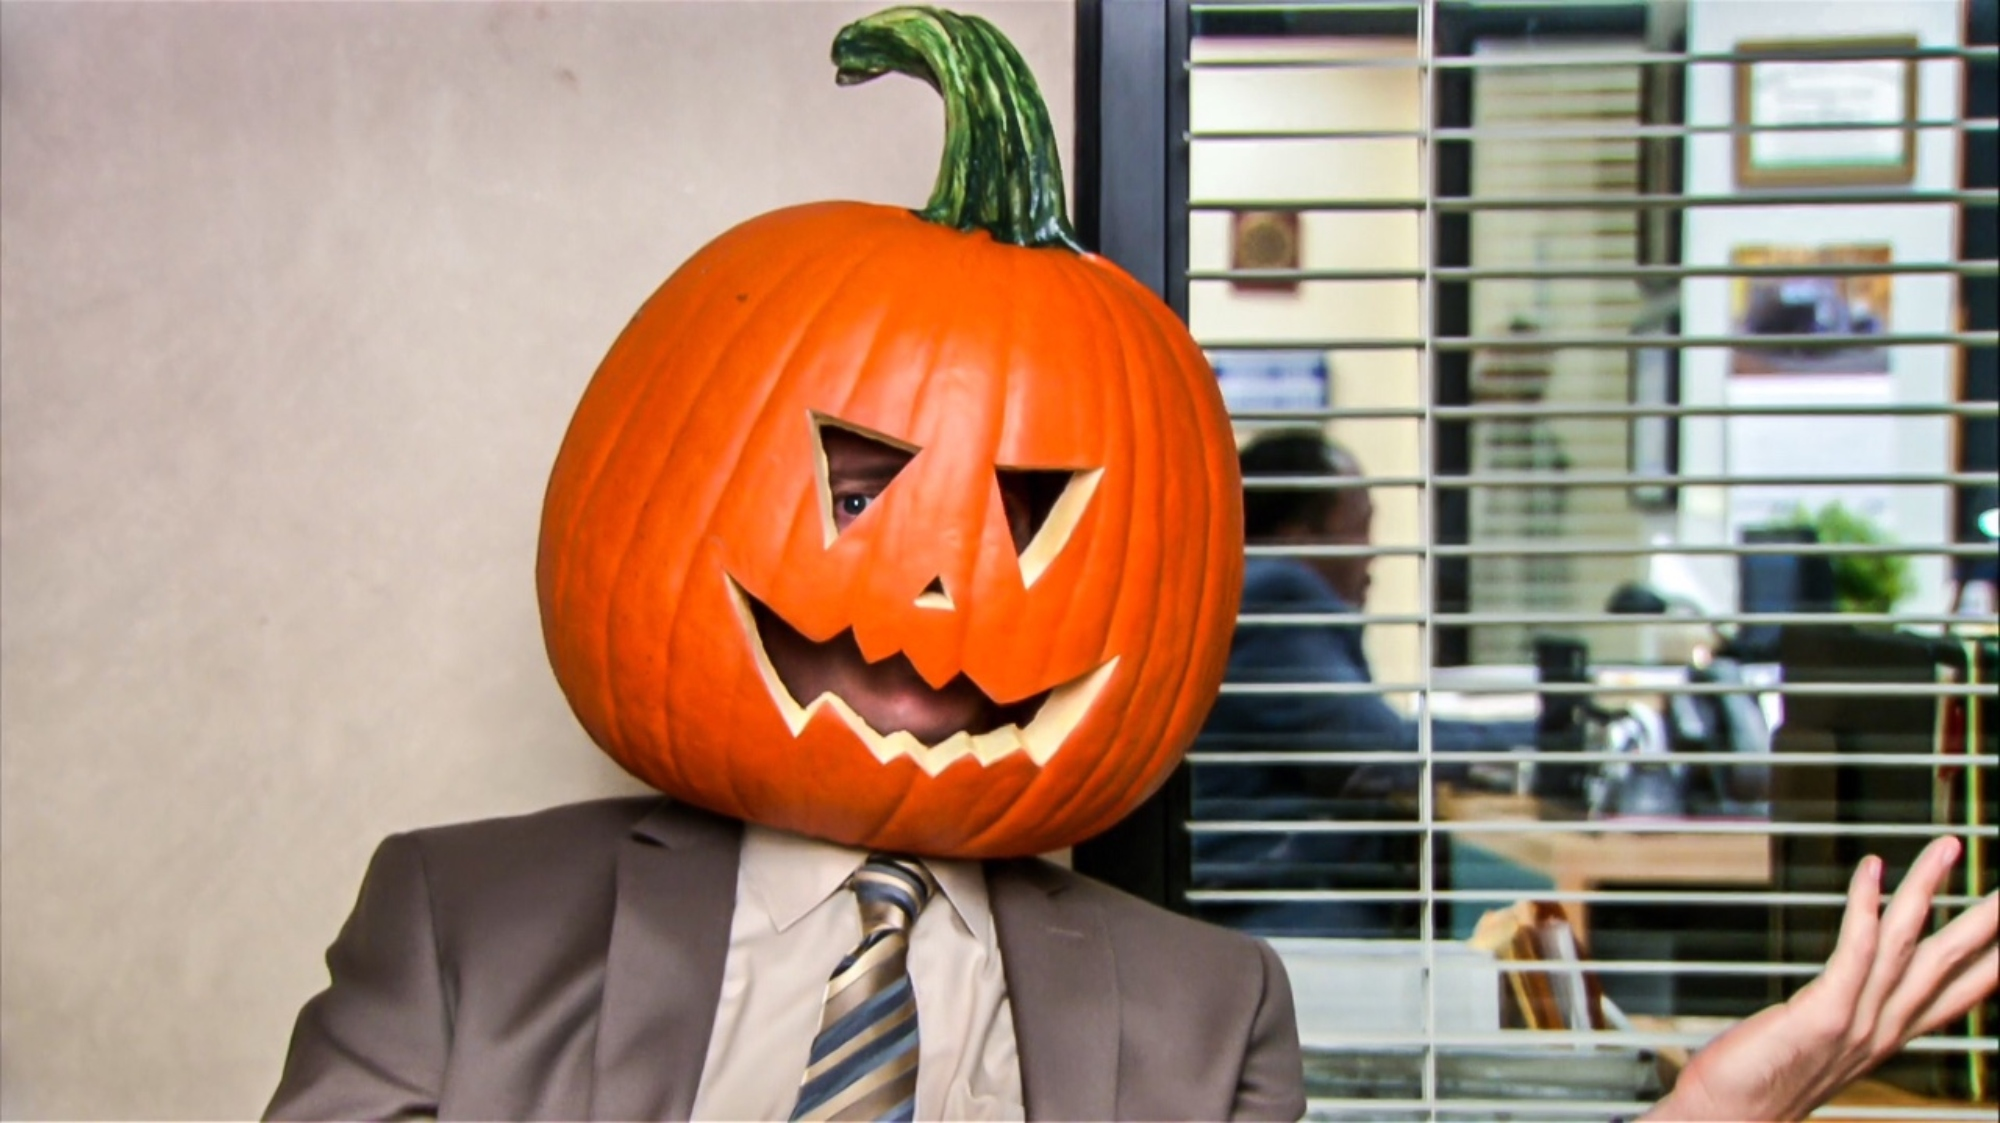 the office halloween pumpkin head